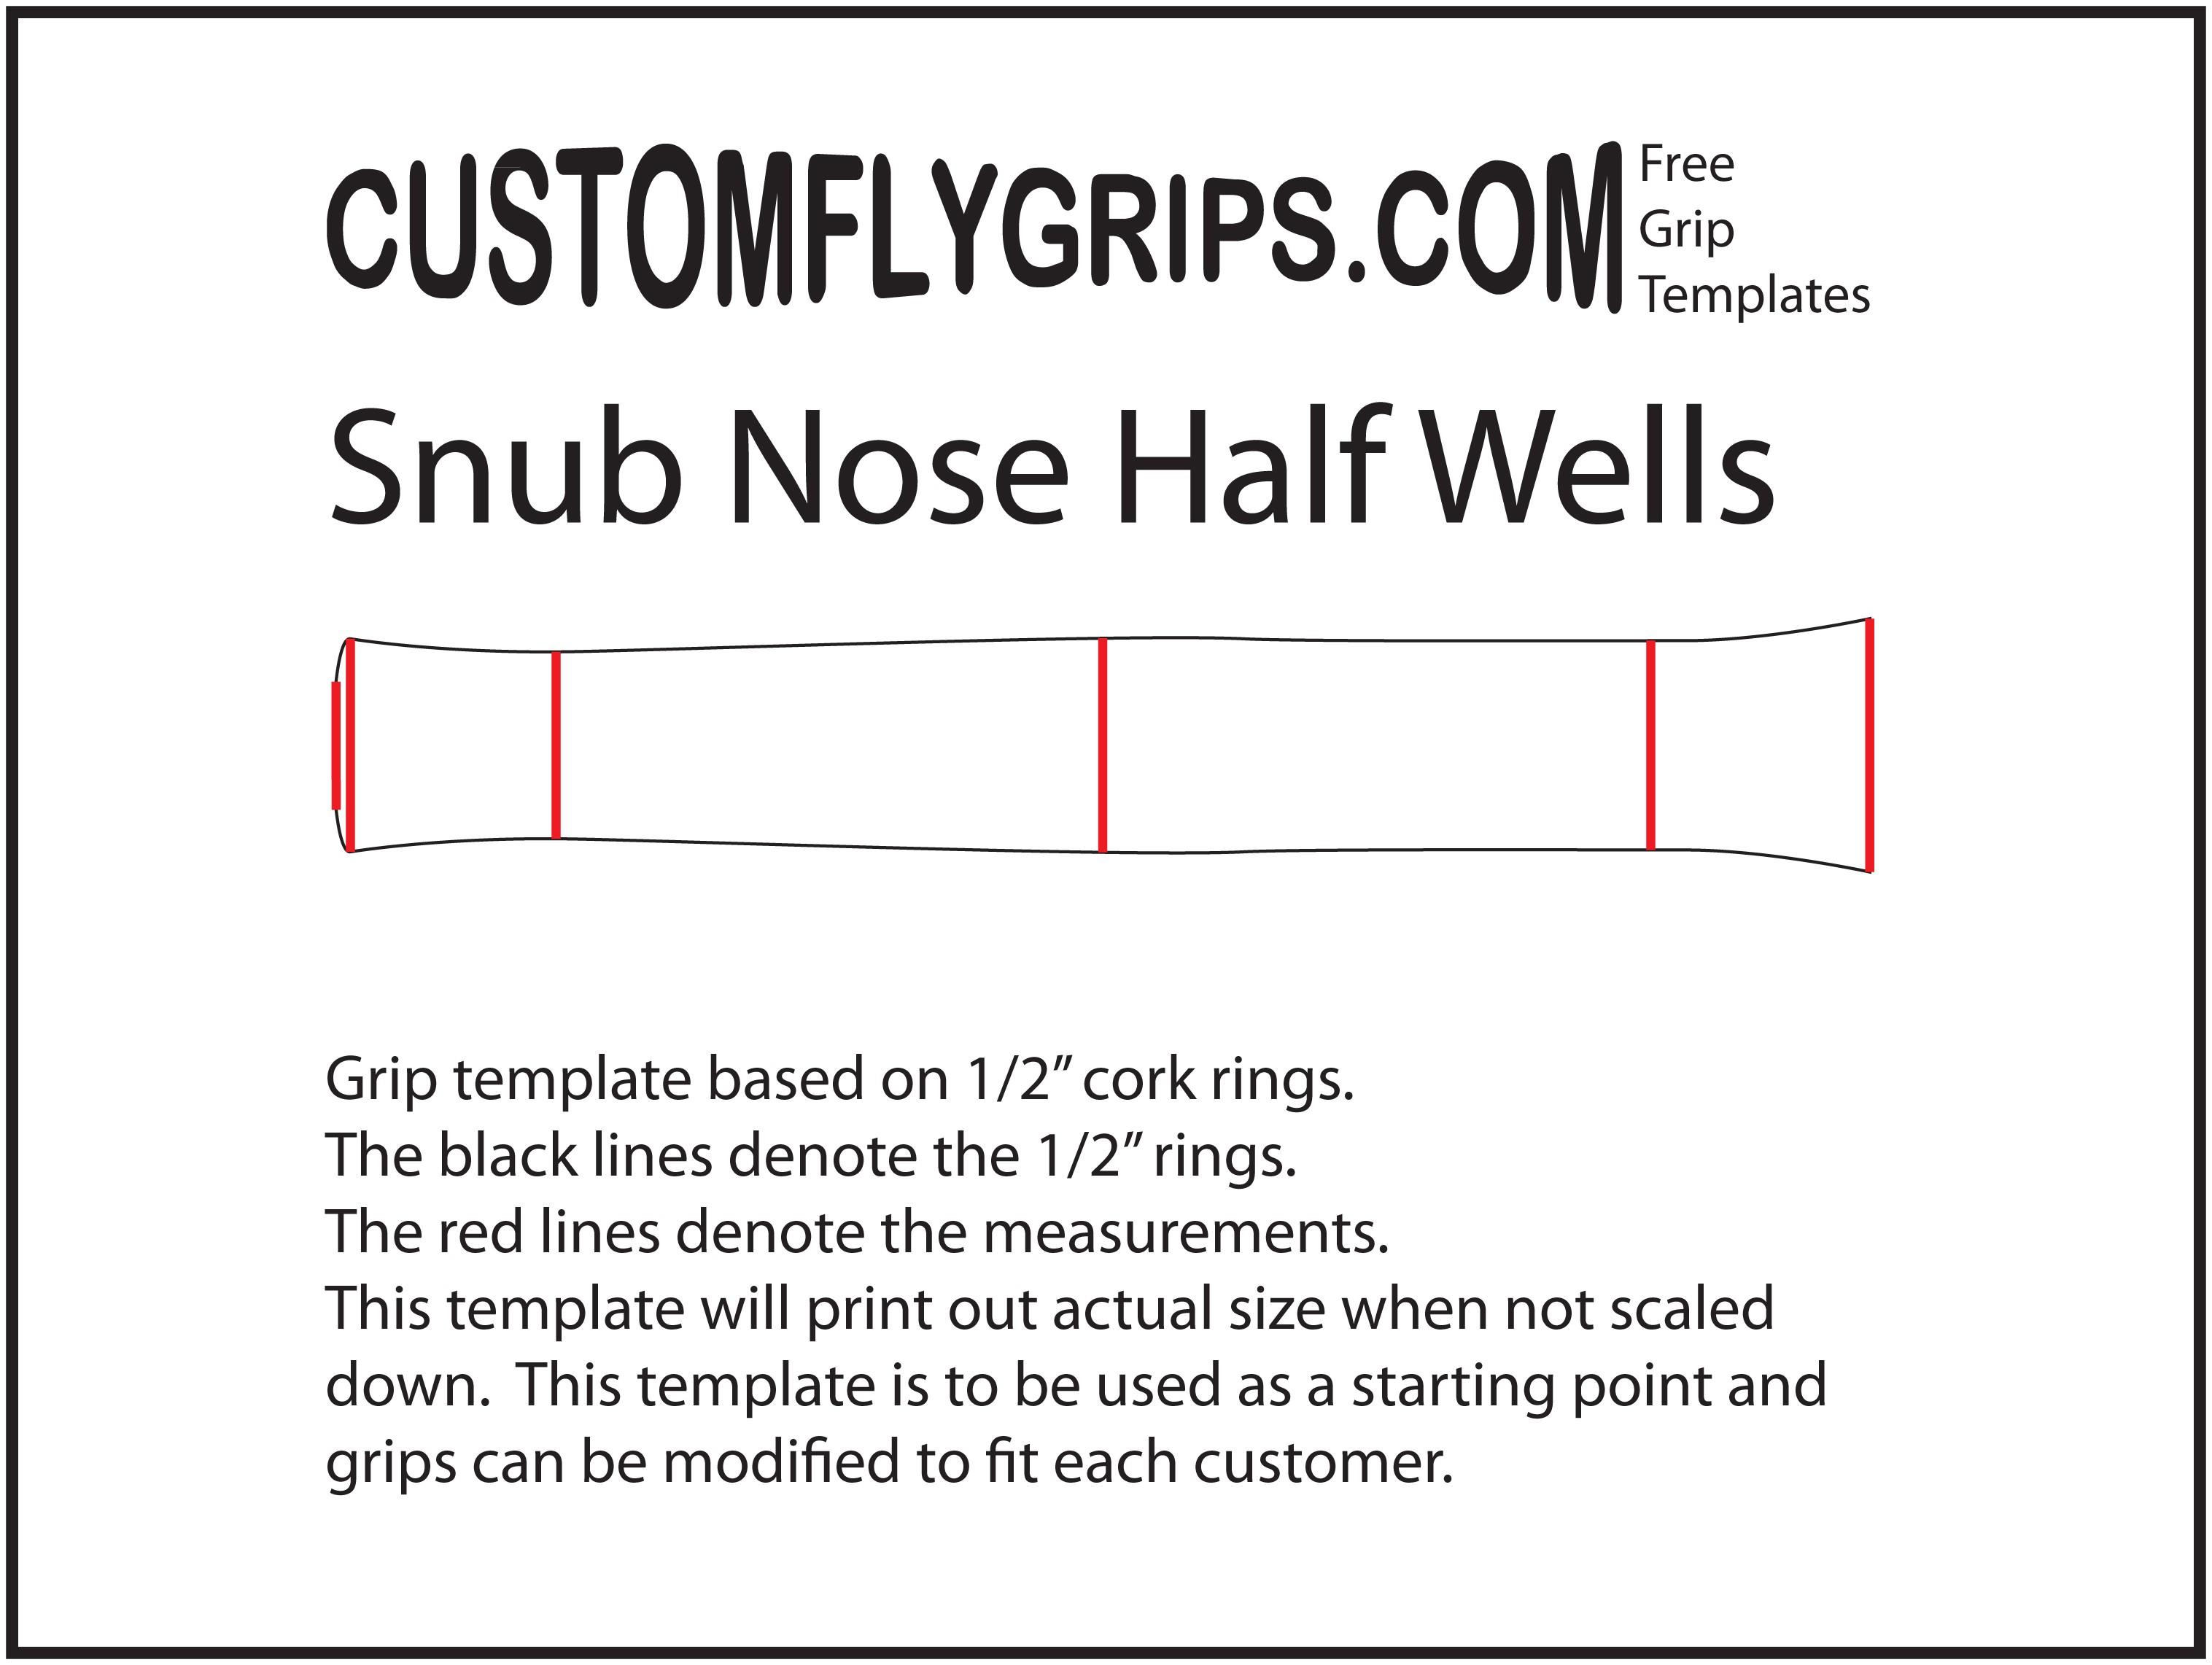 snub nose half wells free grip template custom fly grips llc